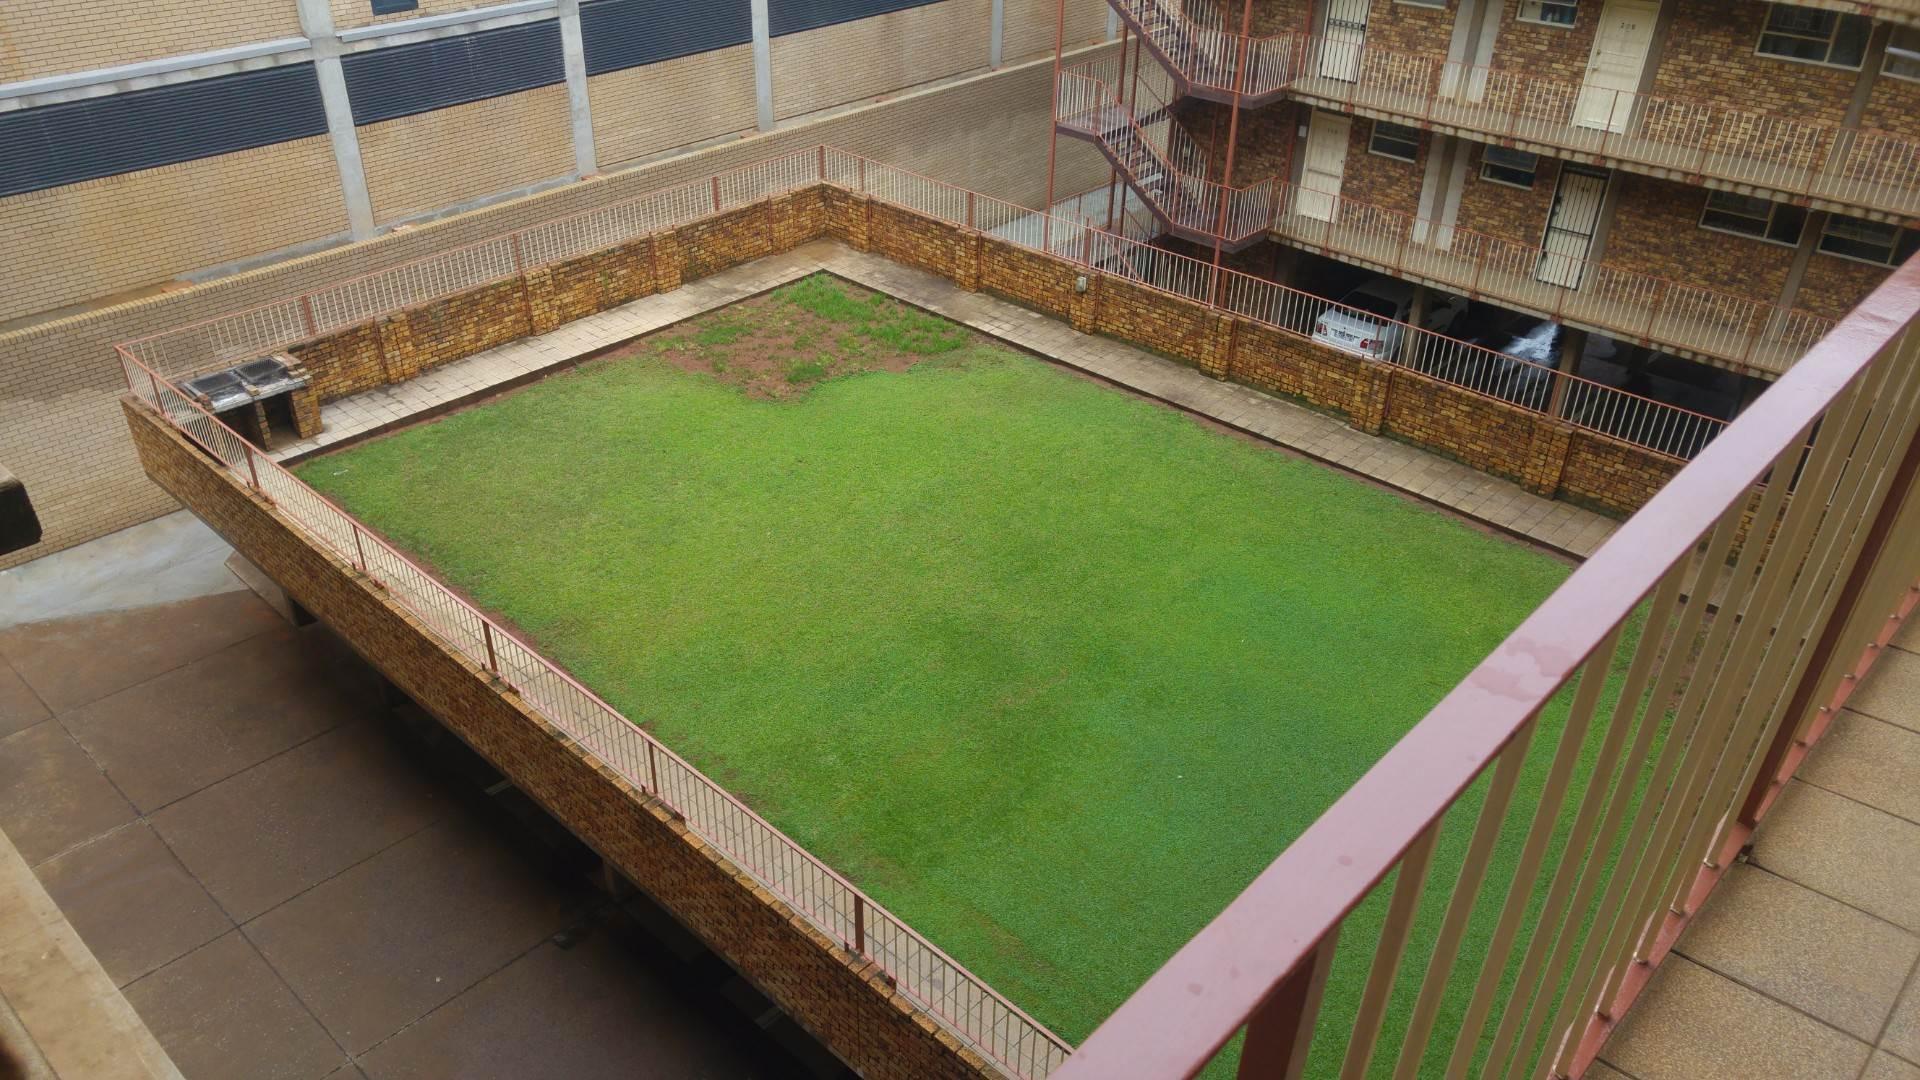 2 BedroomFlat To Rent In Hatfield